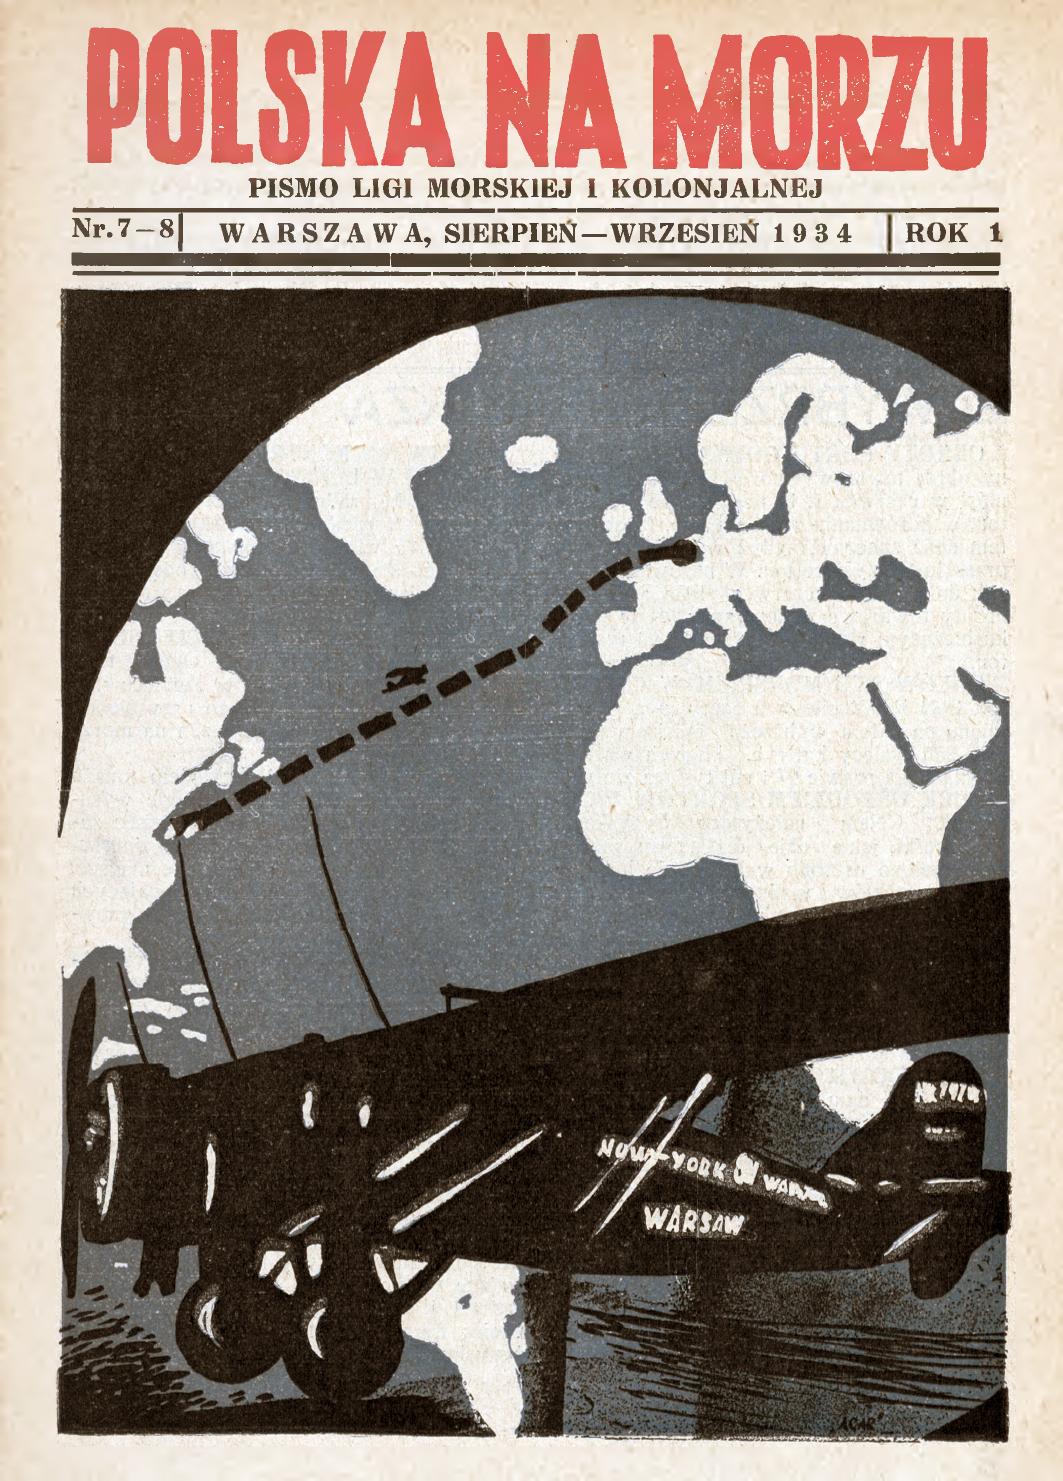 Polska na Morzu : pismo Ligi Morskiej i Kolonjalnej. - Liga Morska i Kolonialna, 1934, nr 7/8